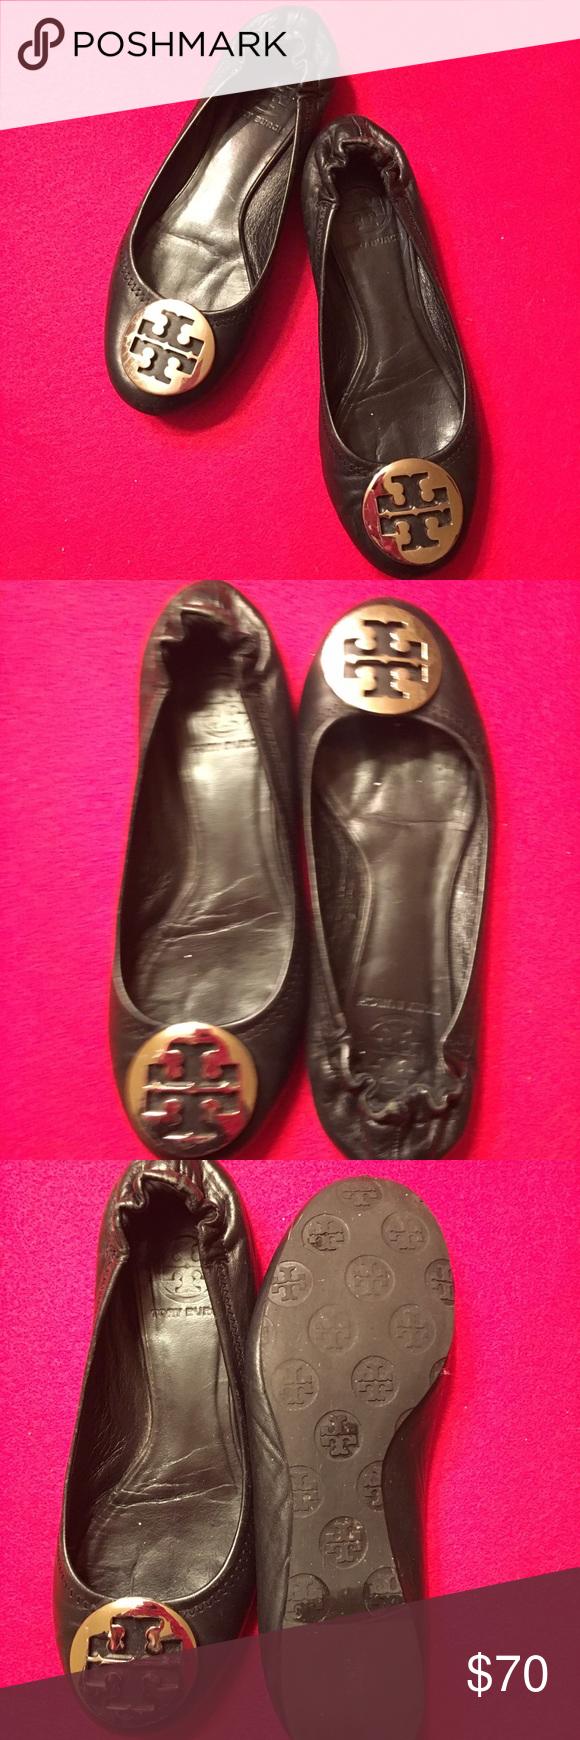 3a18dea72 ... france tory burch black reva logo ballet flats 7 tory burch black leather  reva logo ballet